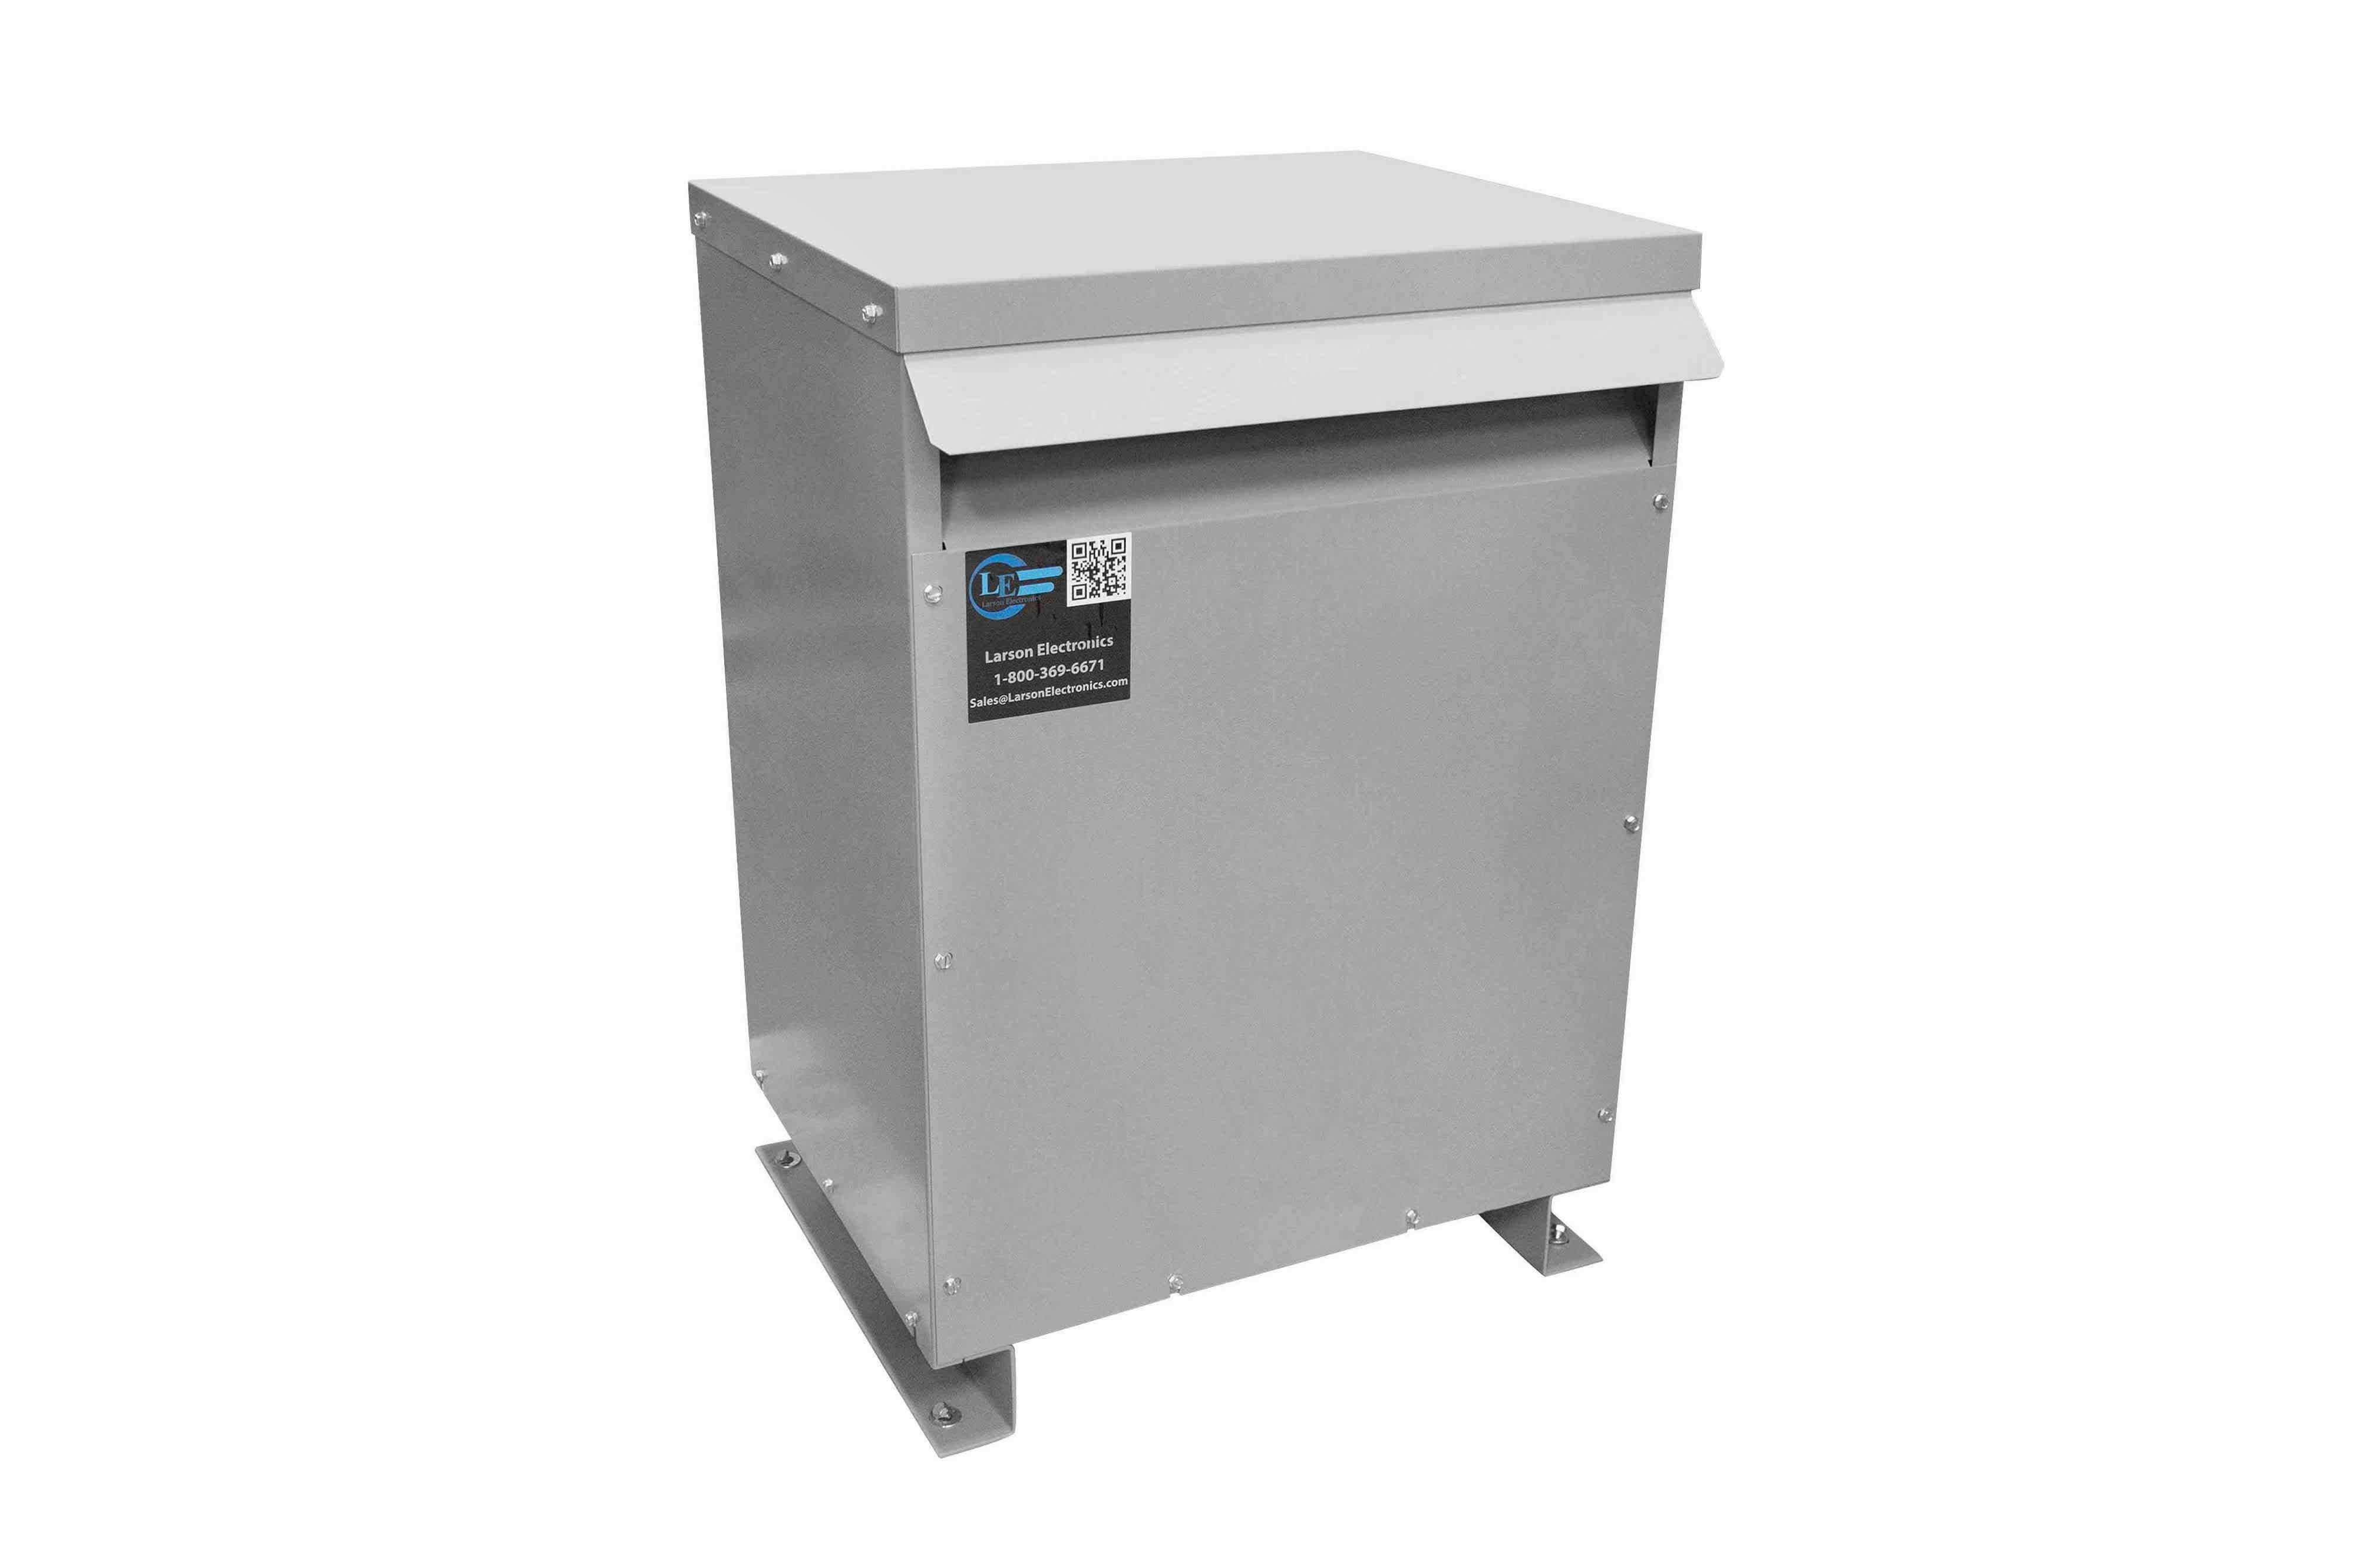 30 kVA 3PH Isolation Transformer, 575V Wye Primary, 240V/120 Delta Secondary, N3R, Ventilated, 60 Hz